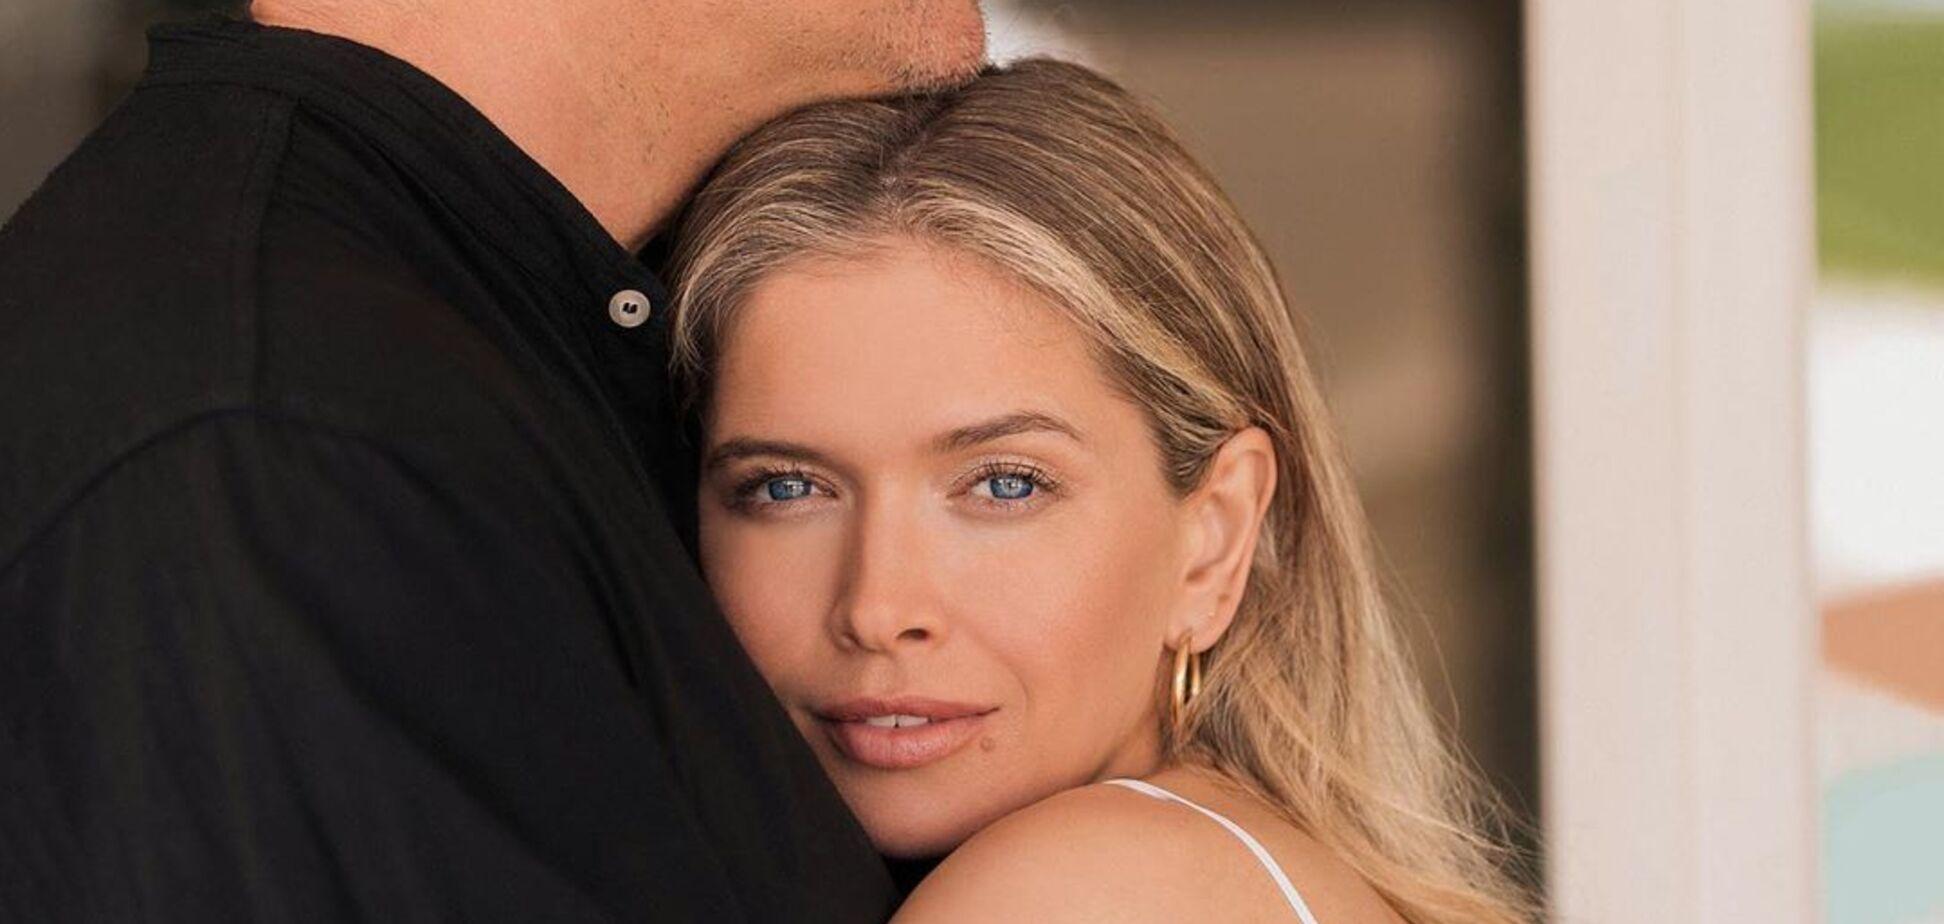 Брежнєва показала фото у ліжку з Меладзе: пара міцно обіймалася